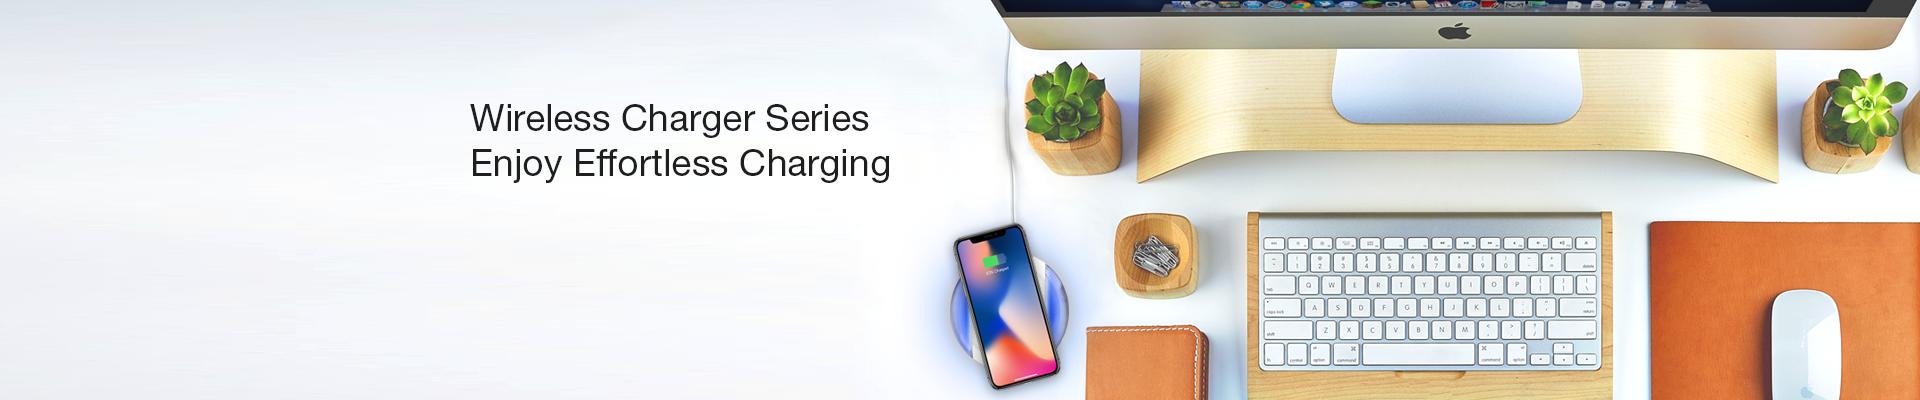 iXEVO Flash Drive - Extra Storage Space on Your iPhone, iPad & Smartphone